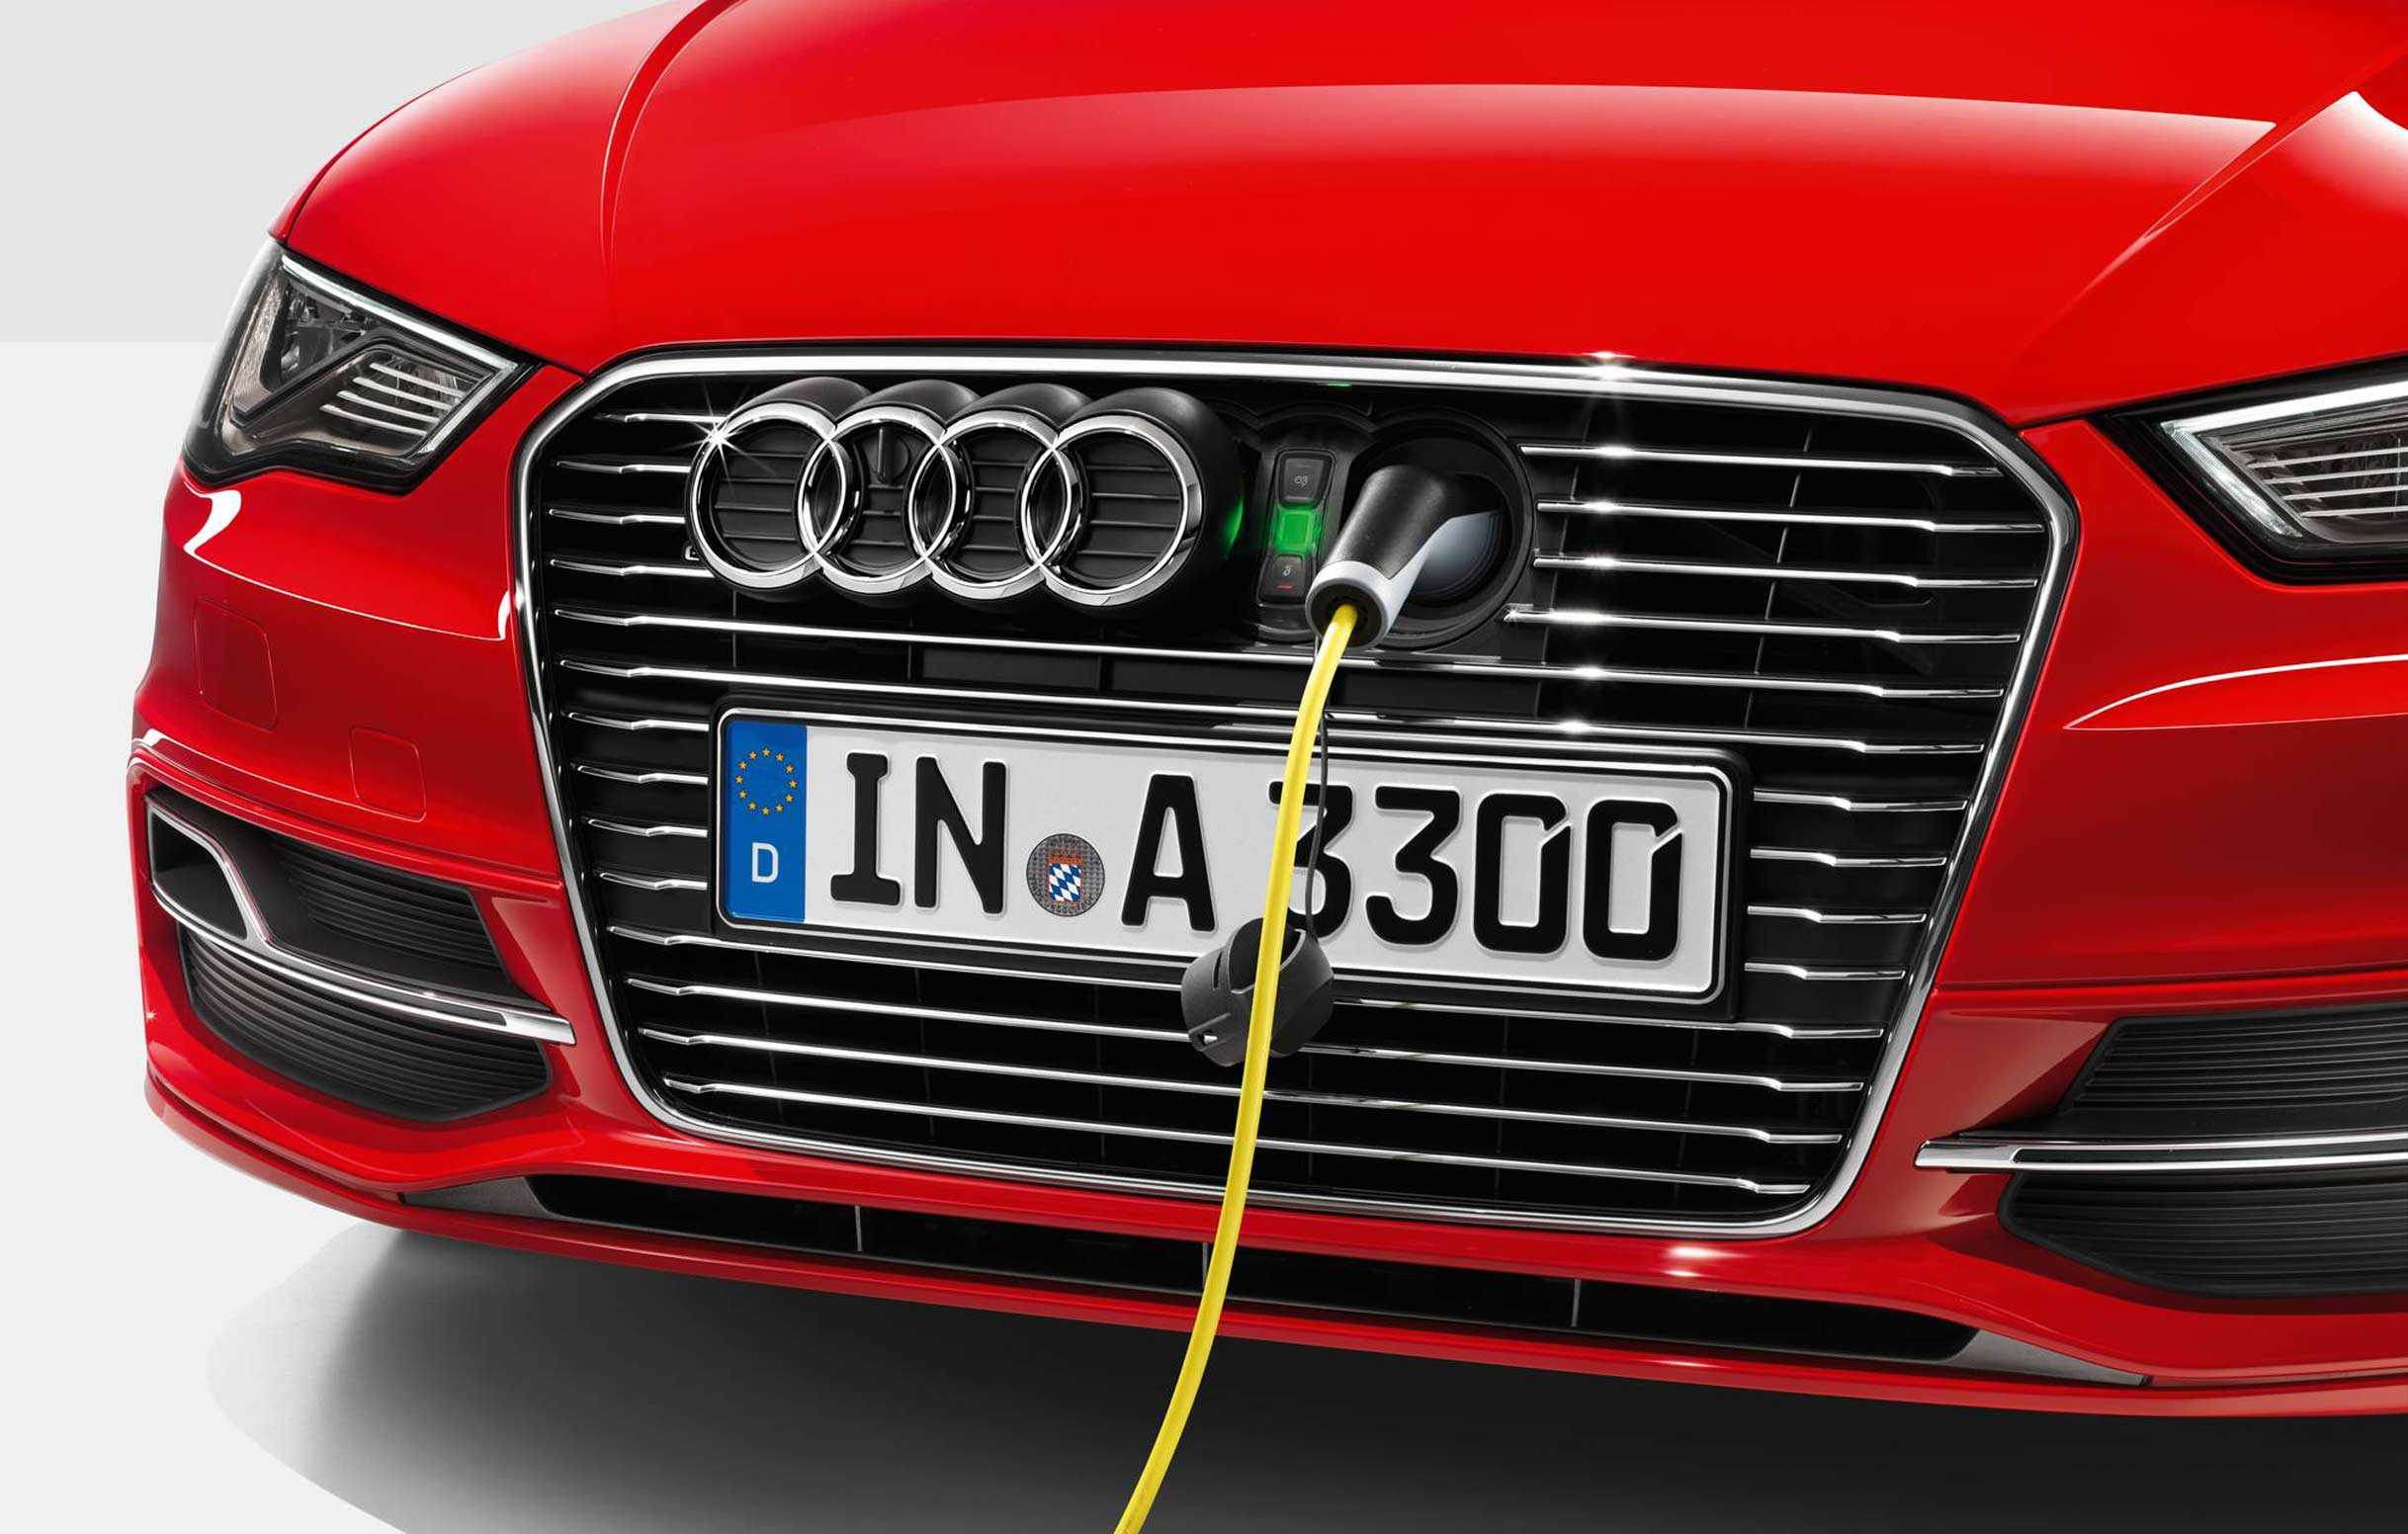 audi a3 sportback e tron is a green vehicle albeit low mileage